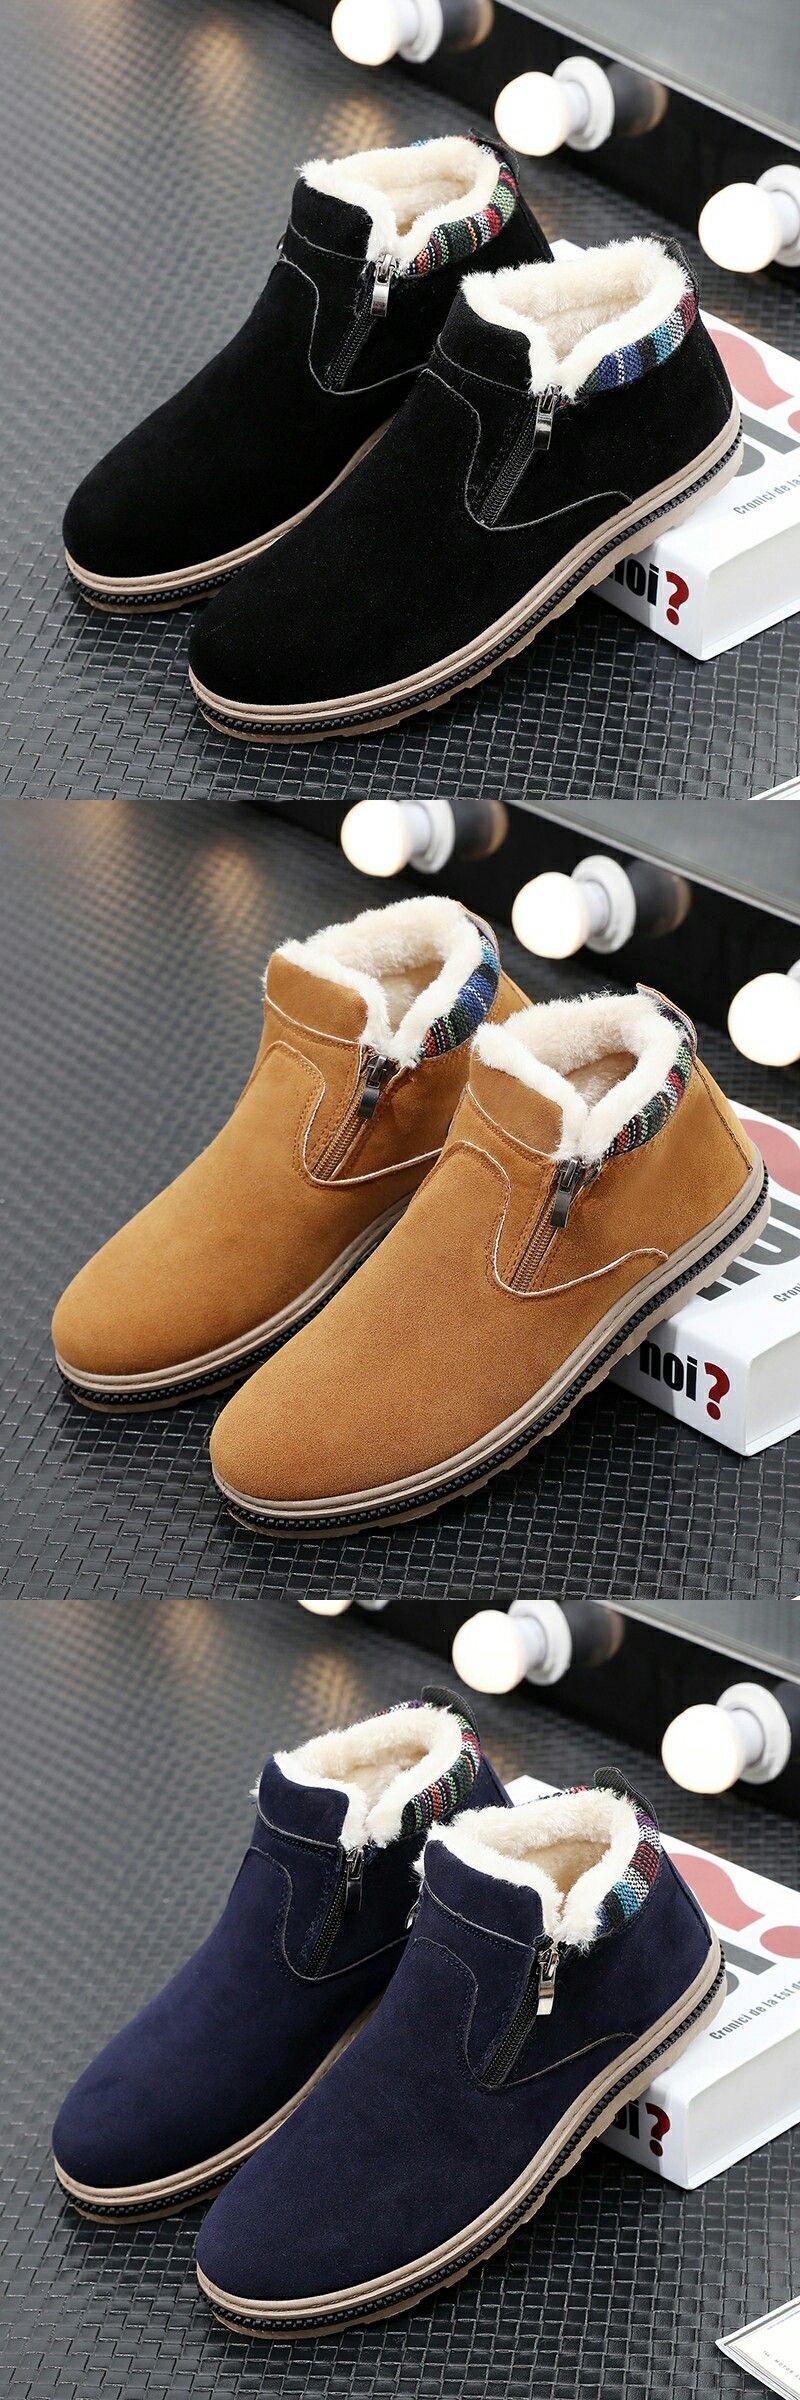 US $19.48 Prelesty Vintage Men Winter Snow Boots Keep Warm